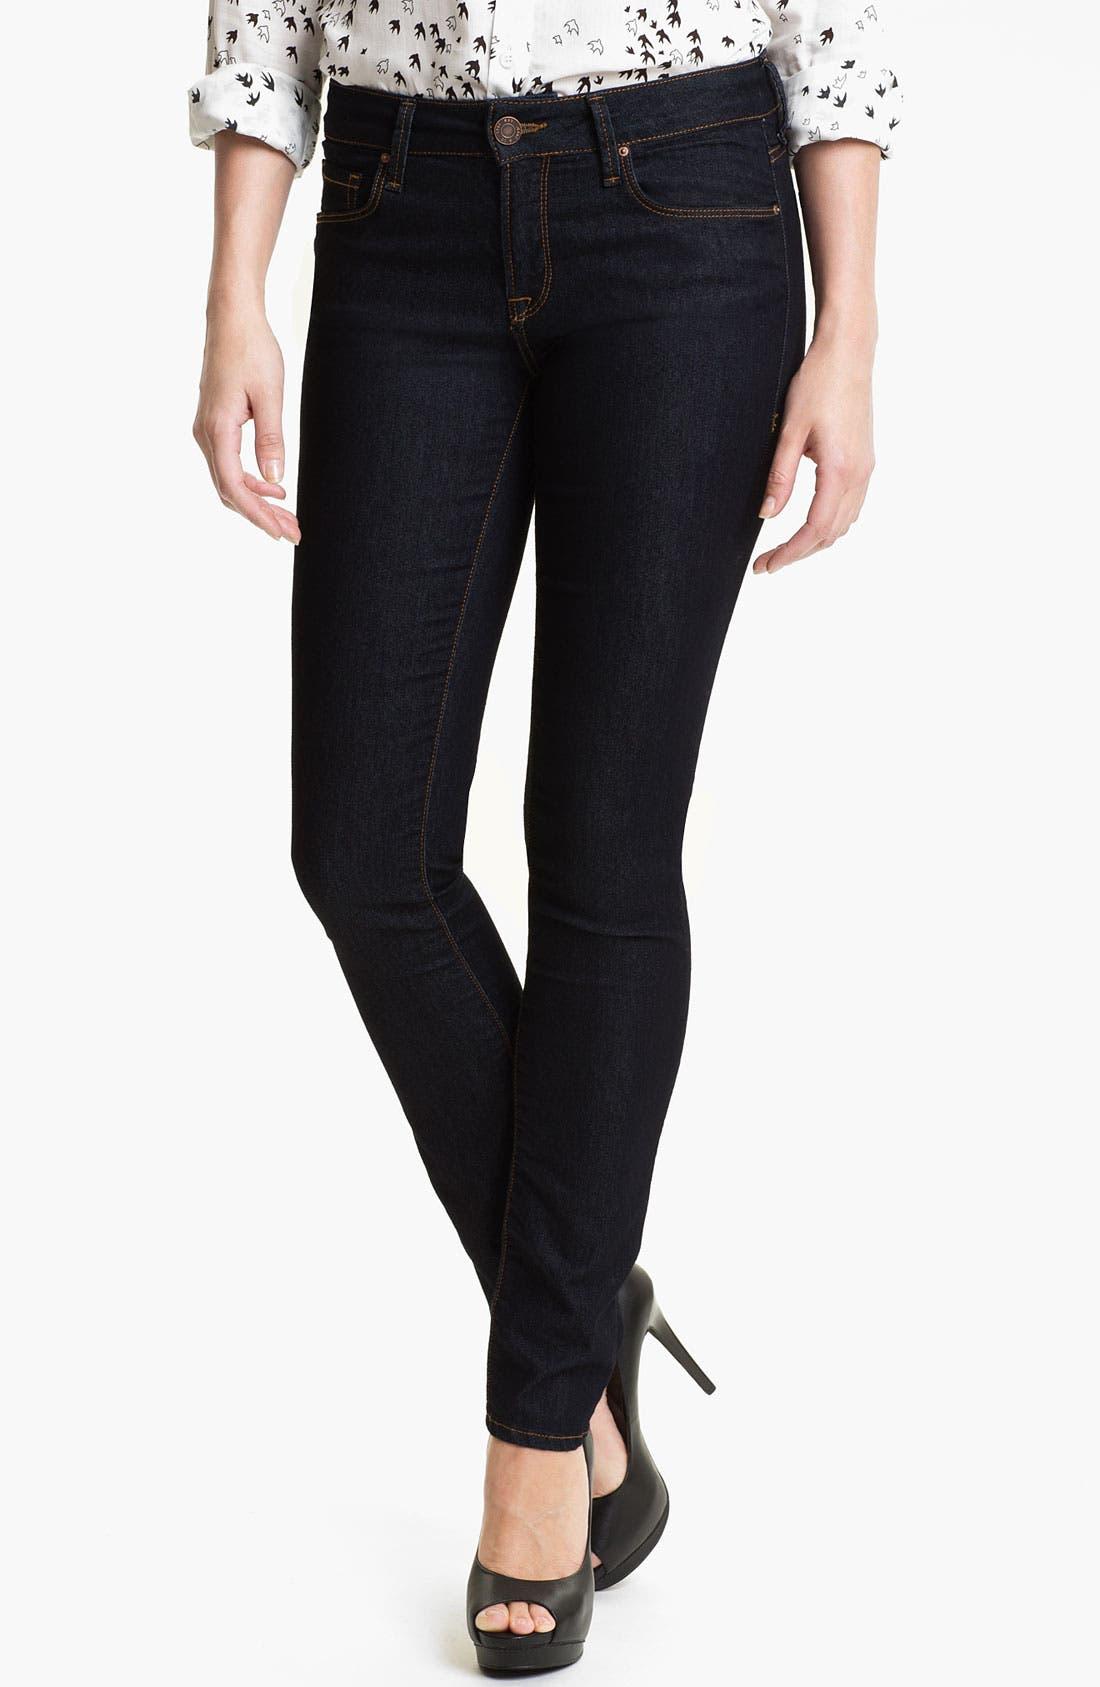 Alternate Image 1 Selected - Mavi Jeans 'Alexa' Mid Rise Super Skinny Jeans (Rinse Super)